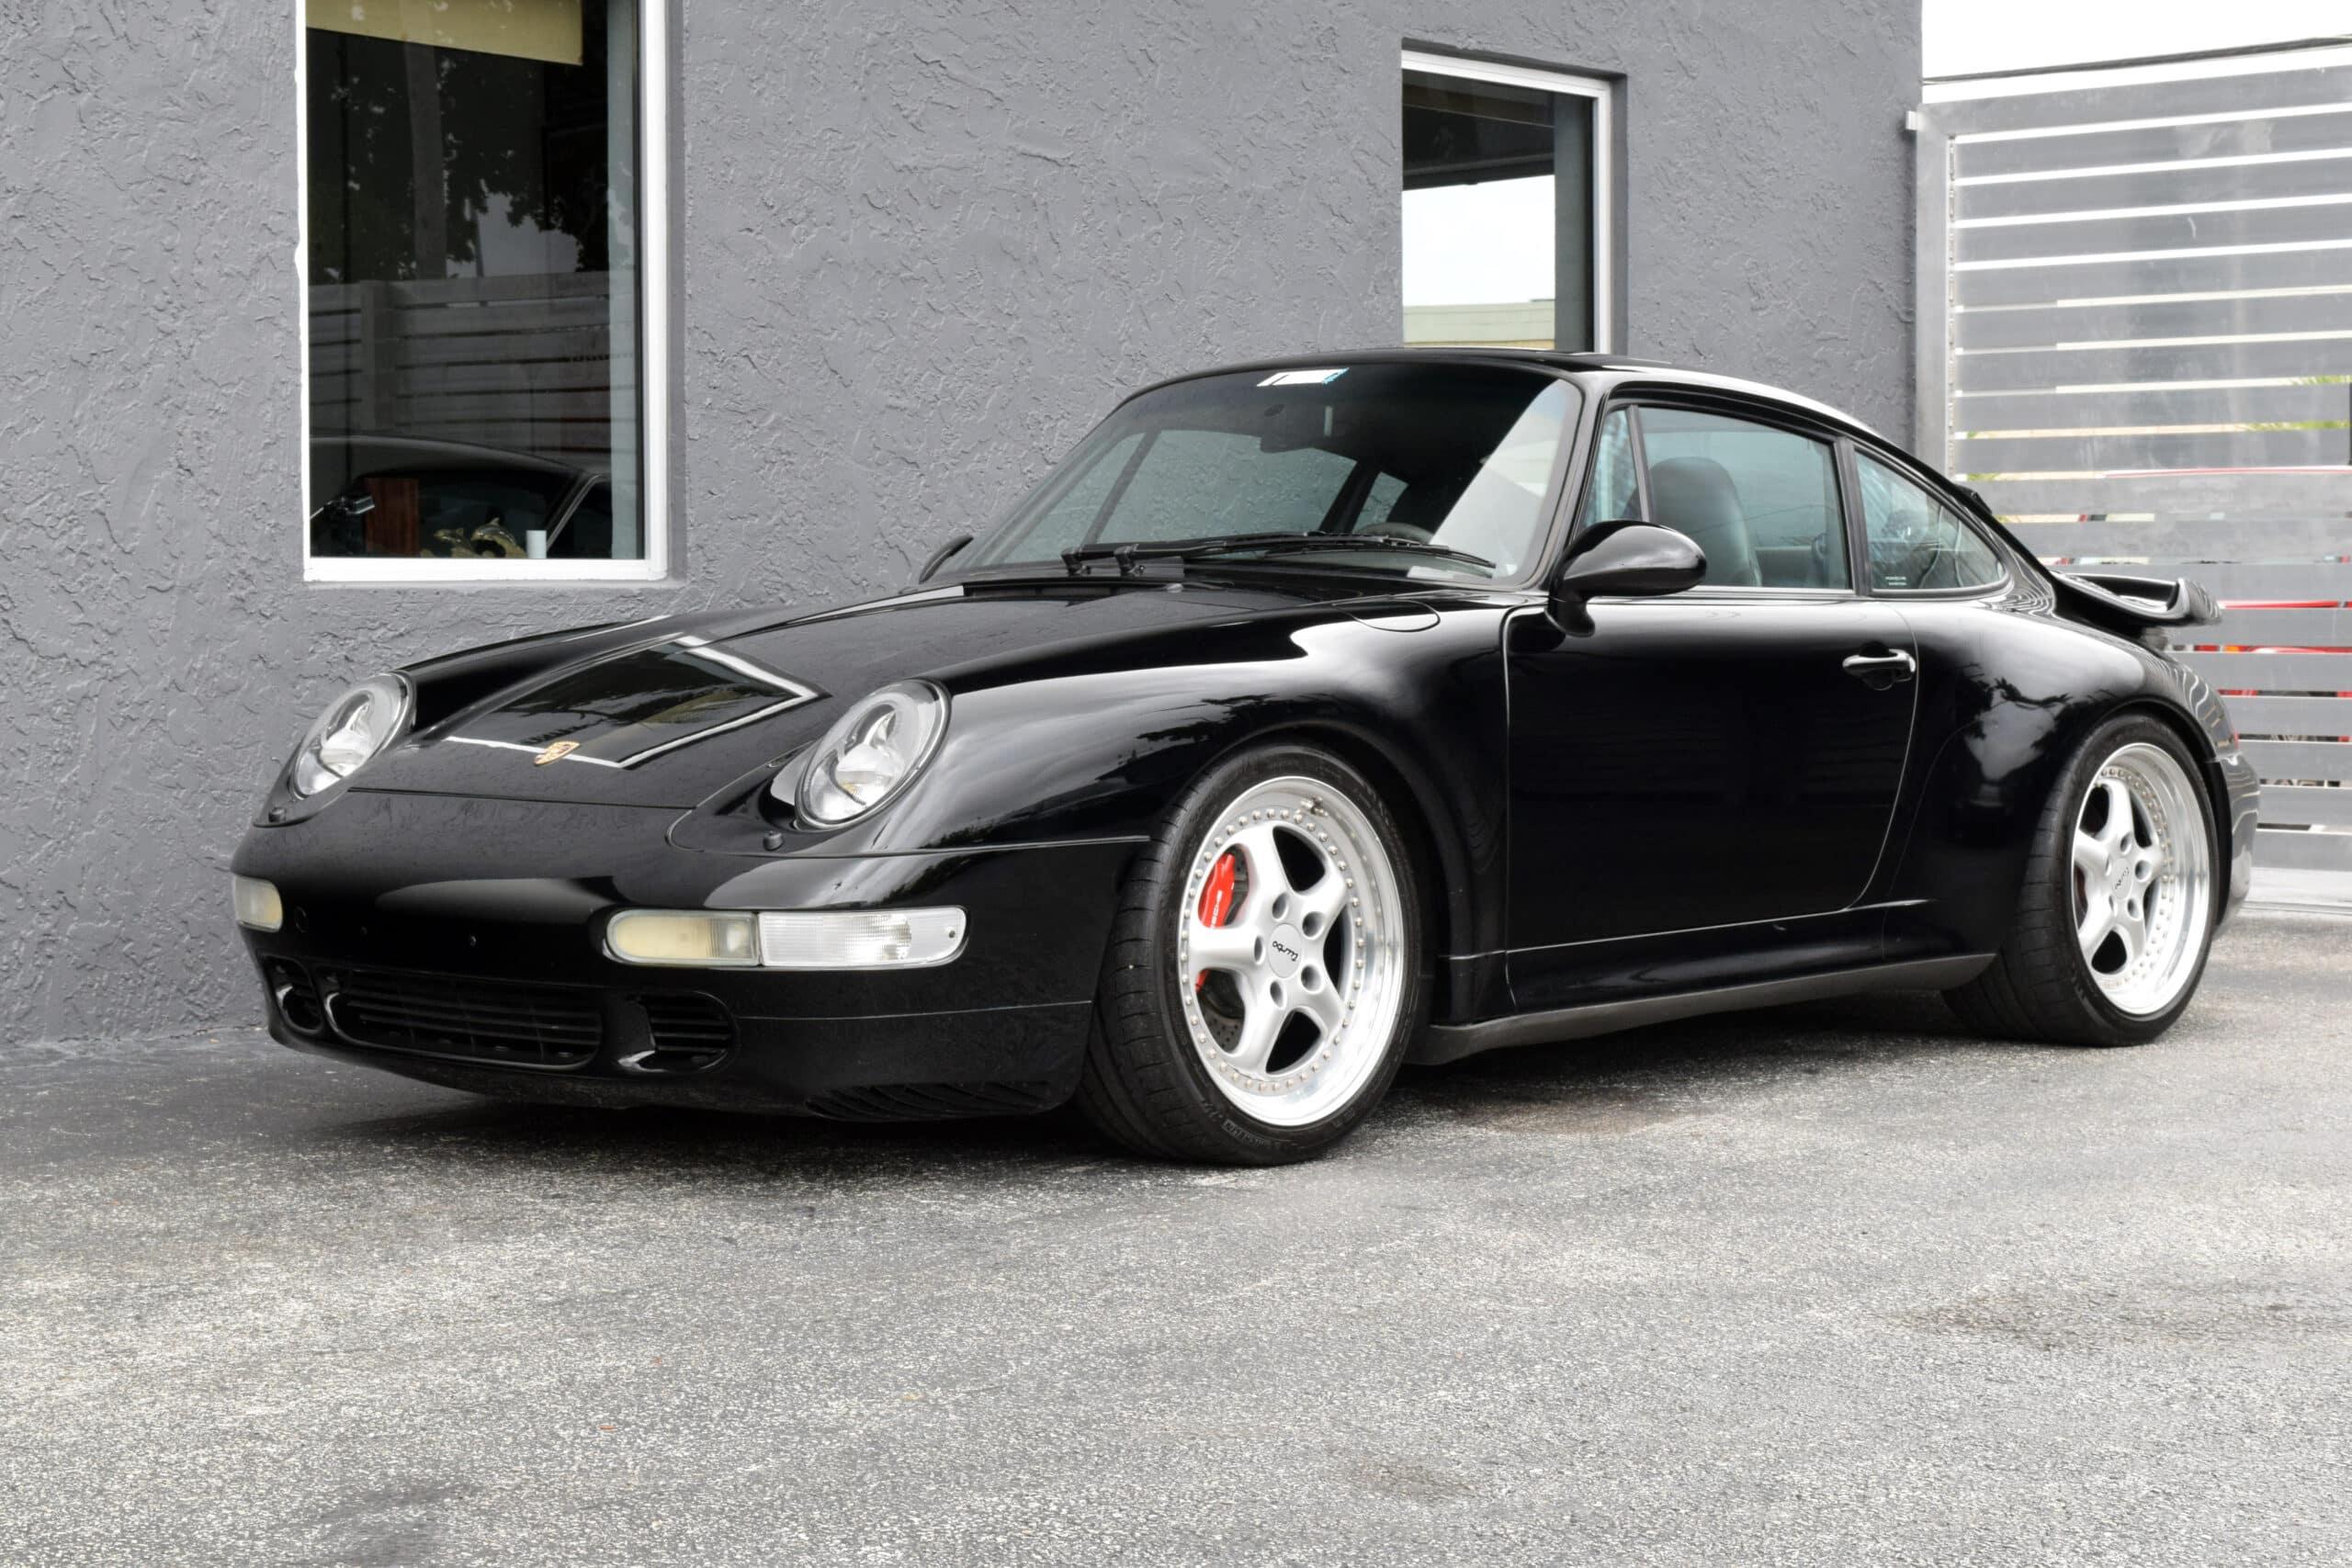 1996 Porsche 993 Turbo, Sports Seats, Carbon interior, major service